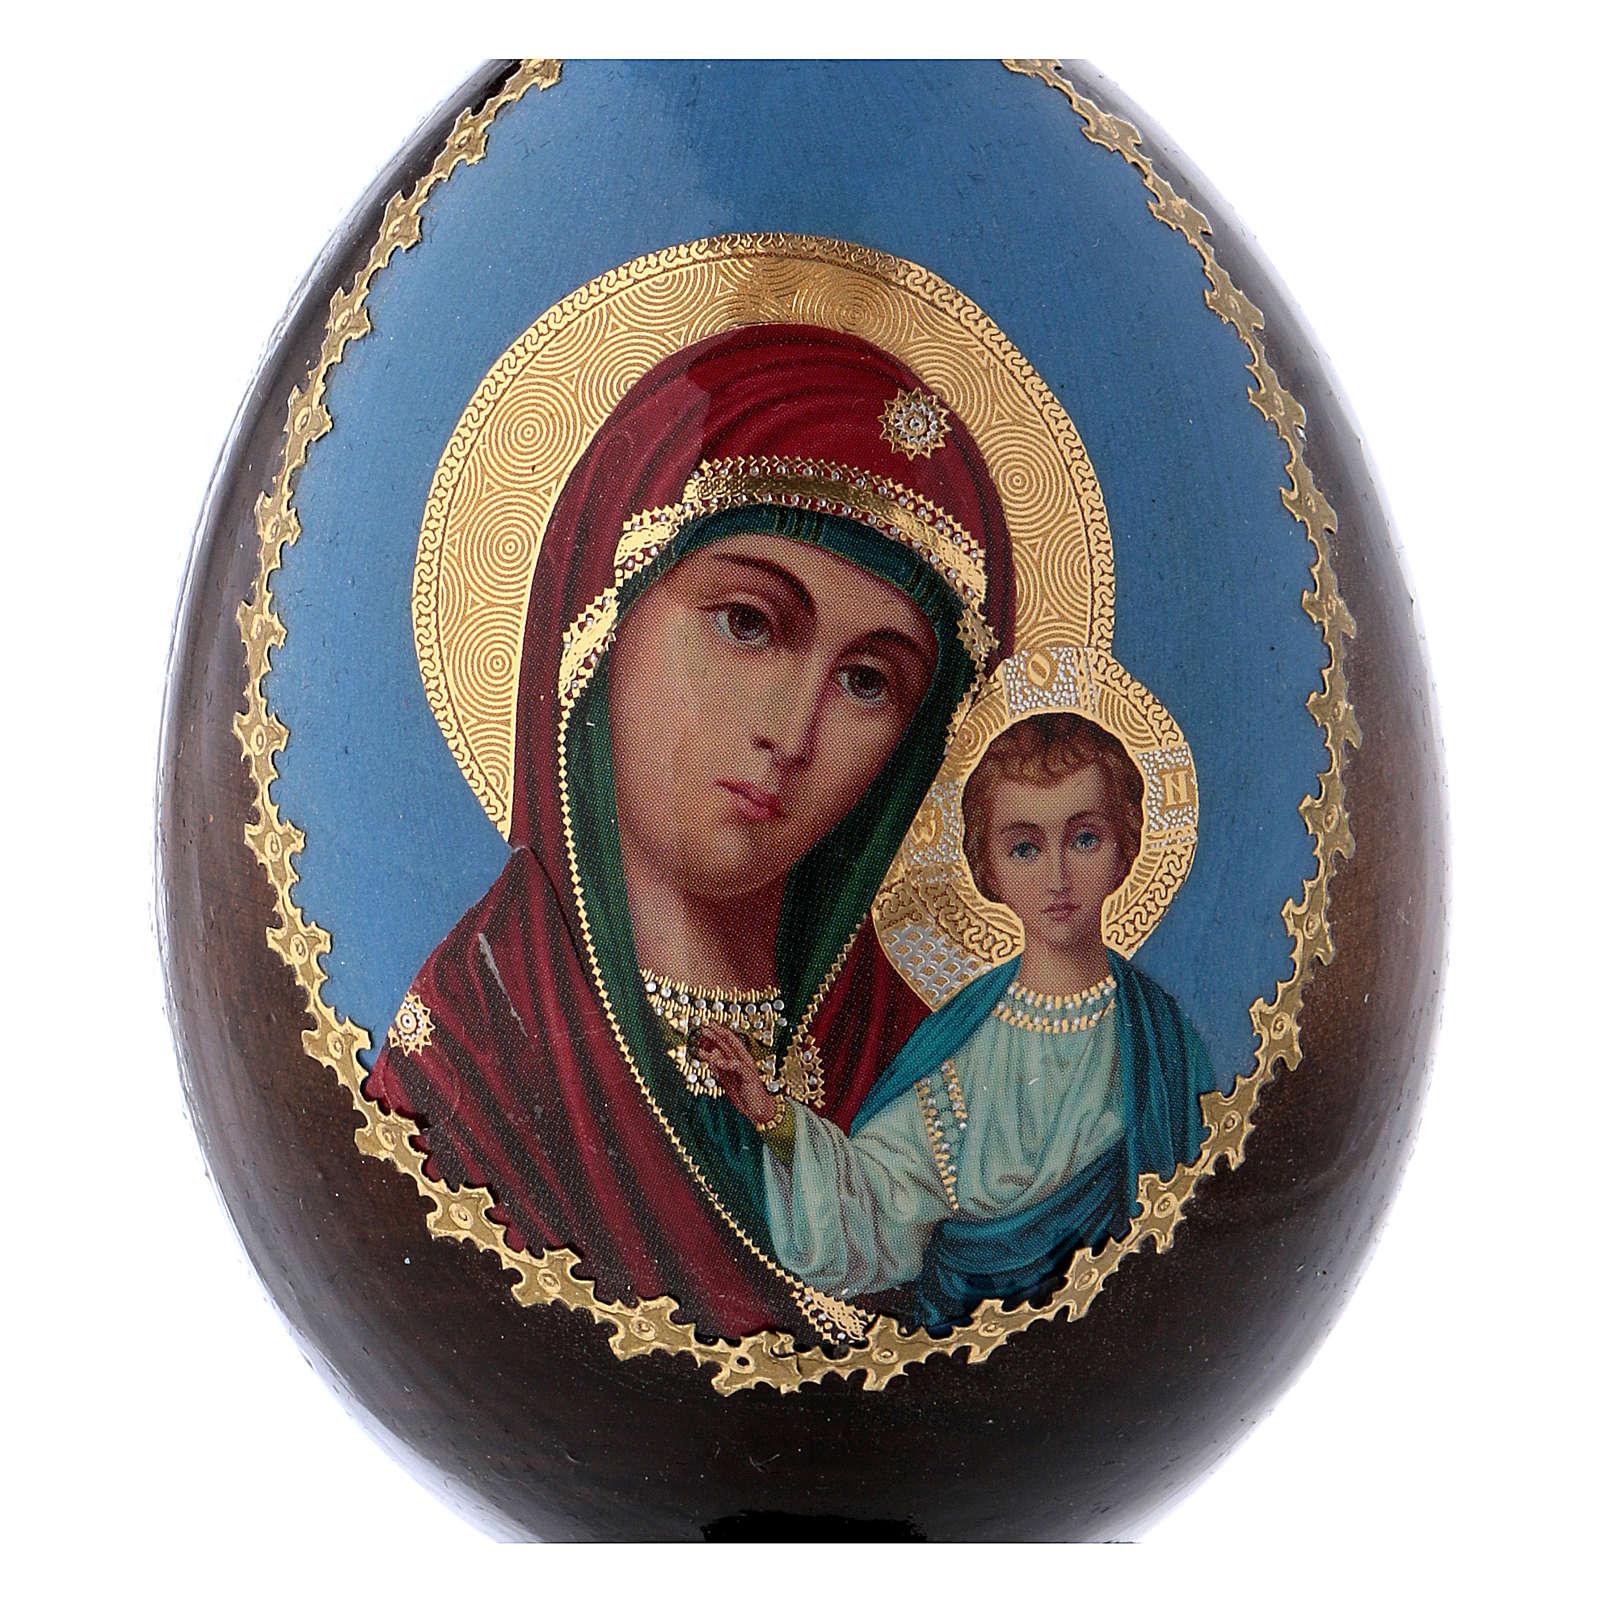 Russian Egg Kazanskaya découpage 13cm 4